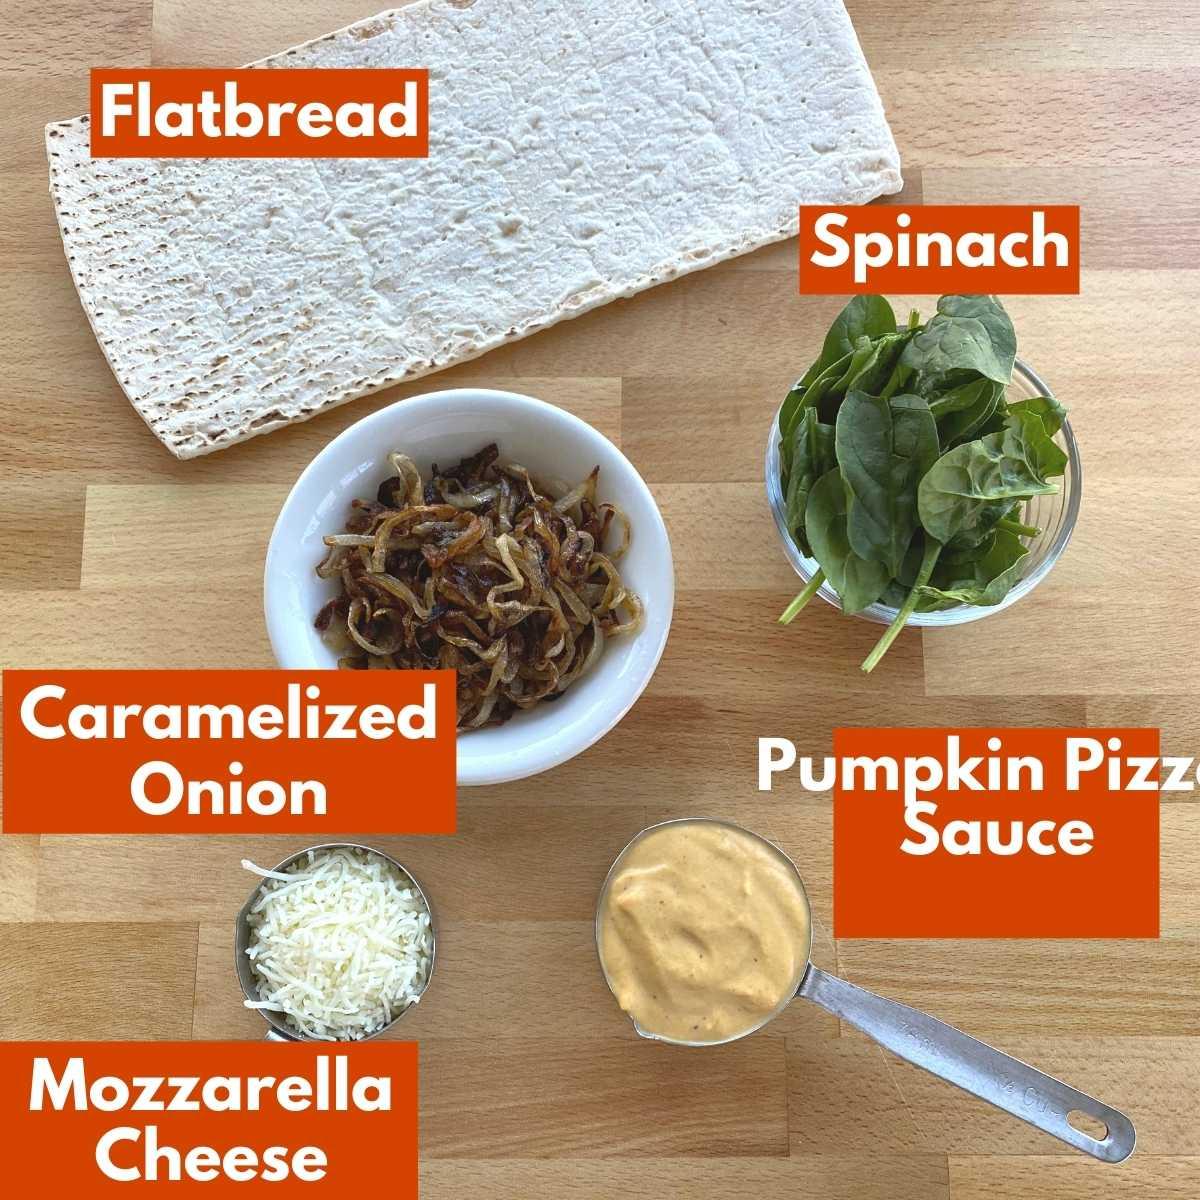 Labeled ingredients to make recipe.